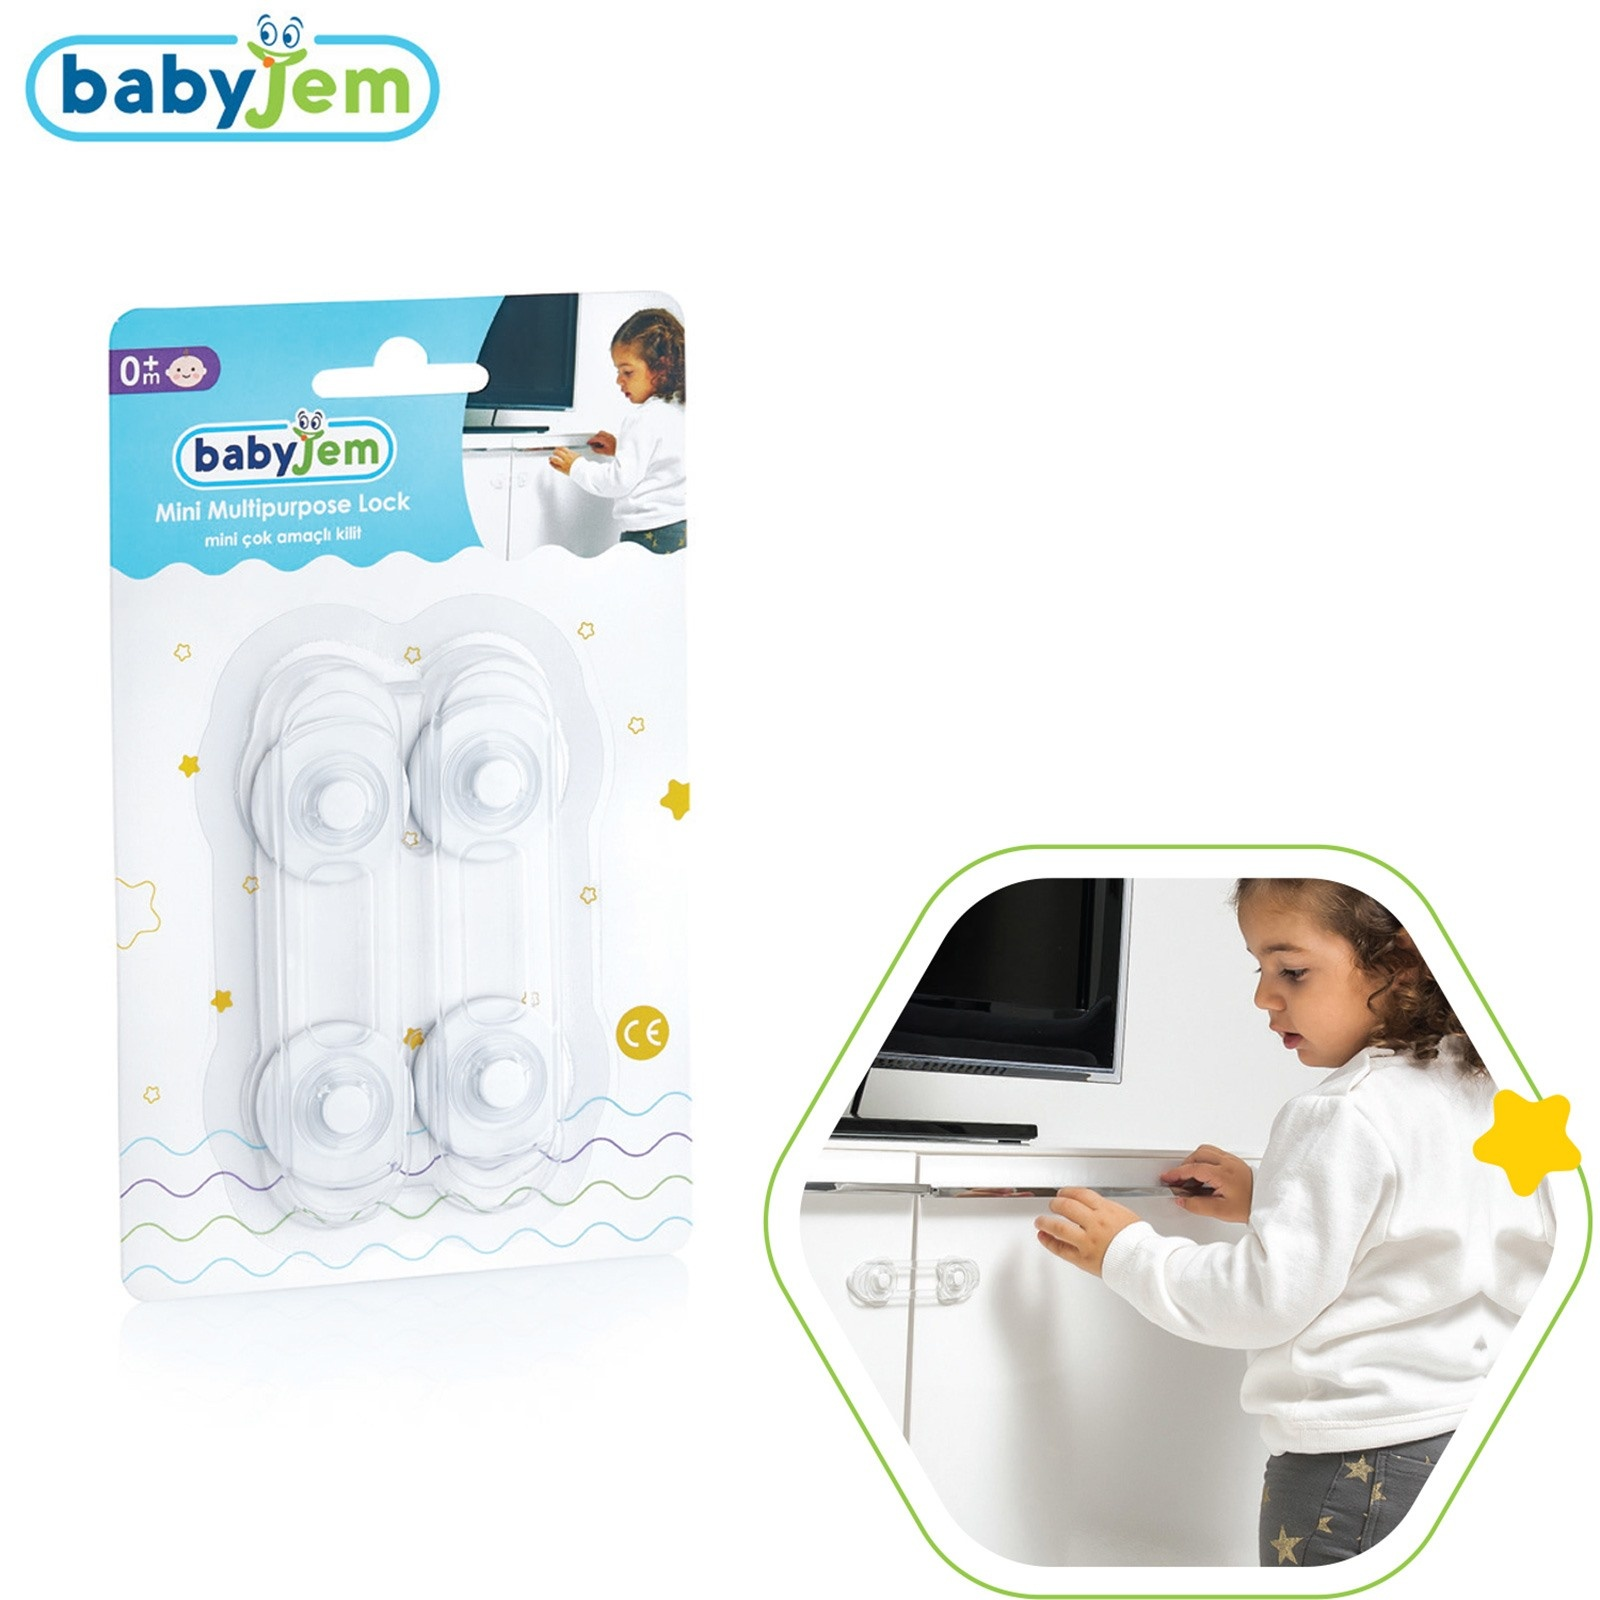 Ebebek Babyjem Mini Multipurpose Baby Lock 2 Pcs